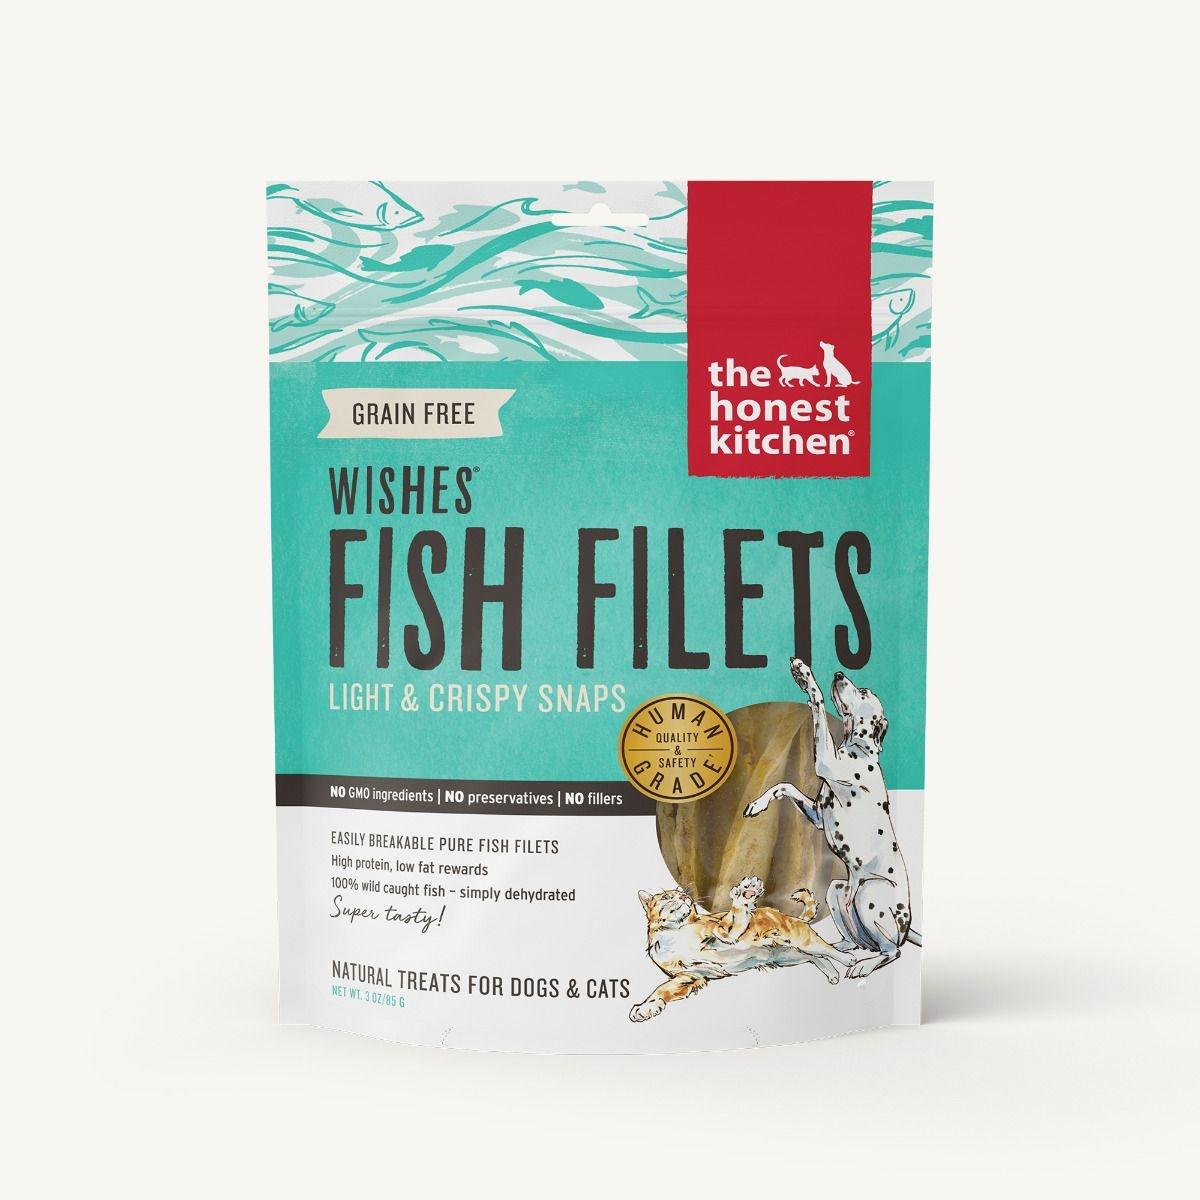 Wishes Filets Whitefish 3oz.